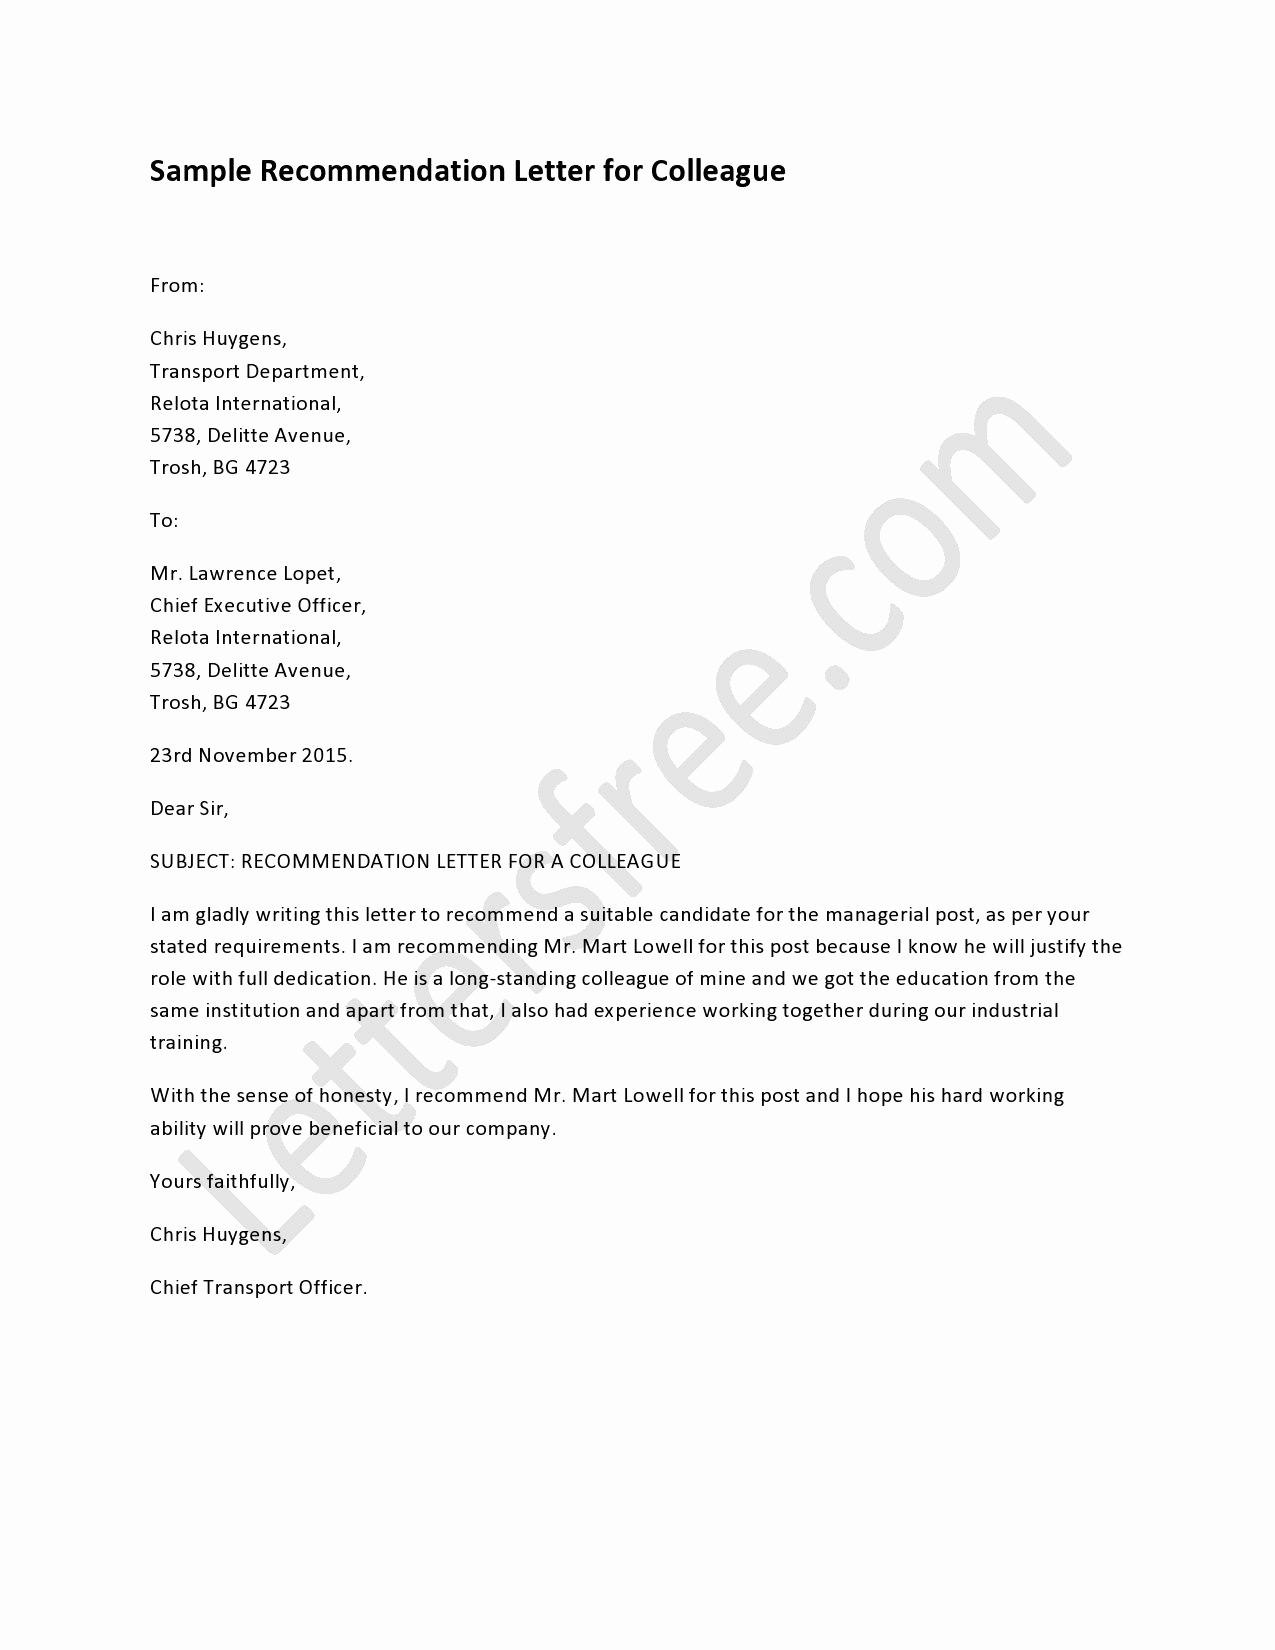 Formats for Letter Of Recommendation Unique Re Mendation Letter for Colleague